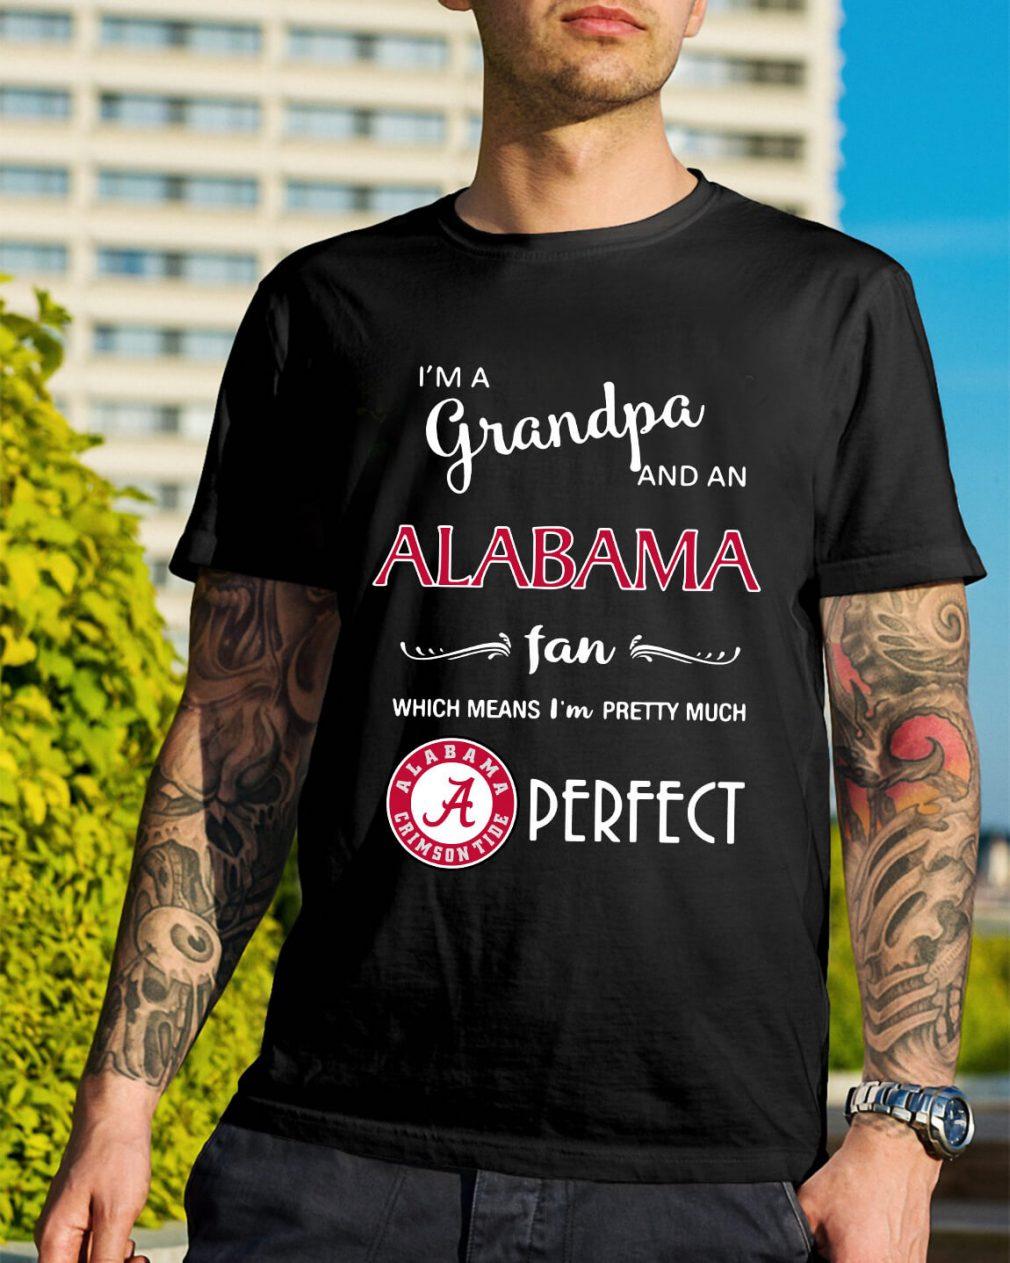 I'm a grandpa and an Alabama Crimson Tide fan which means I'm pretty shirt